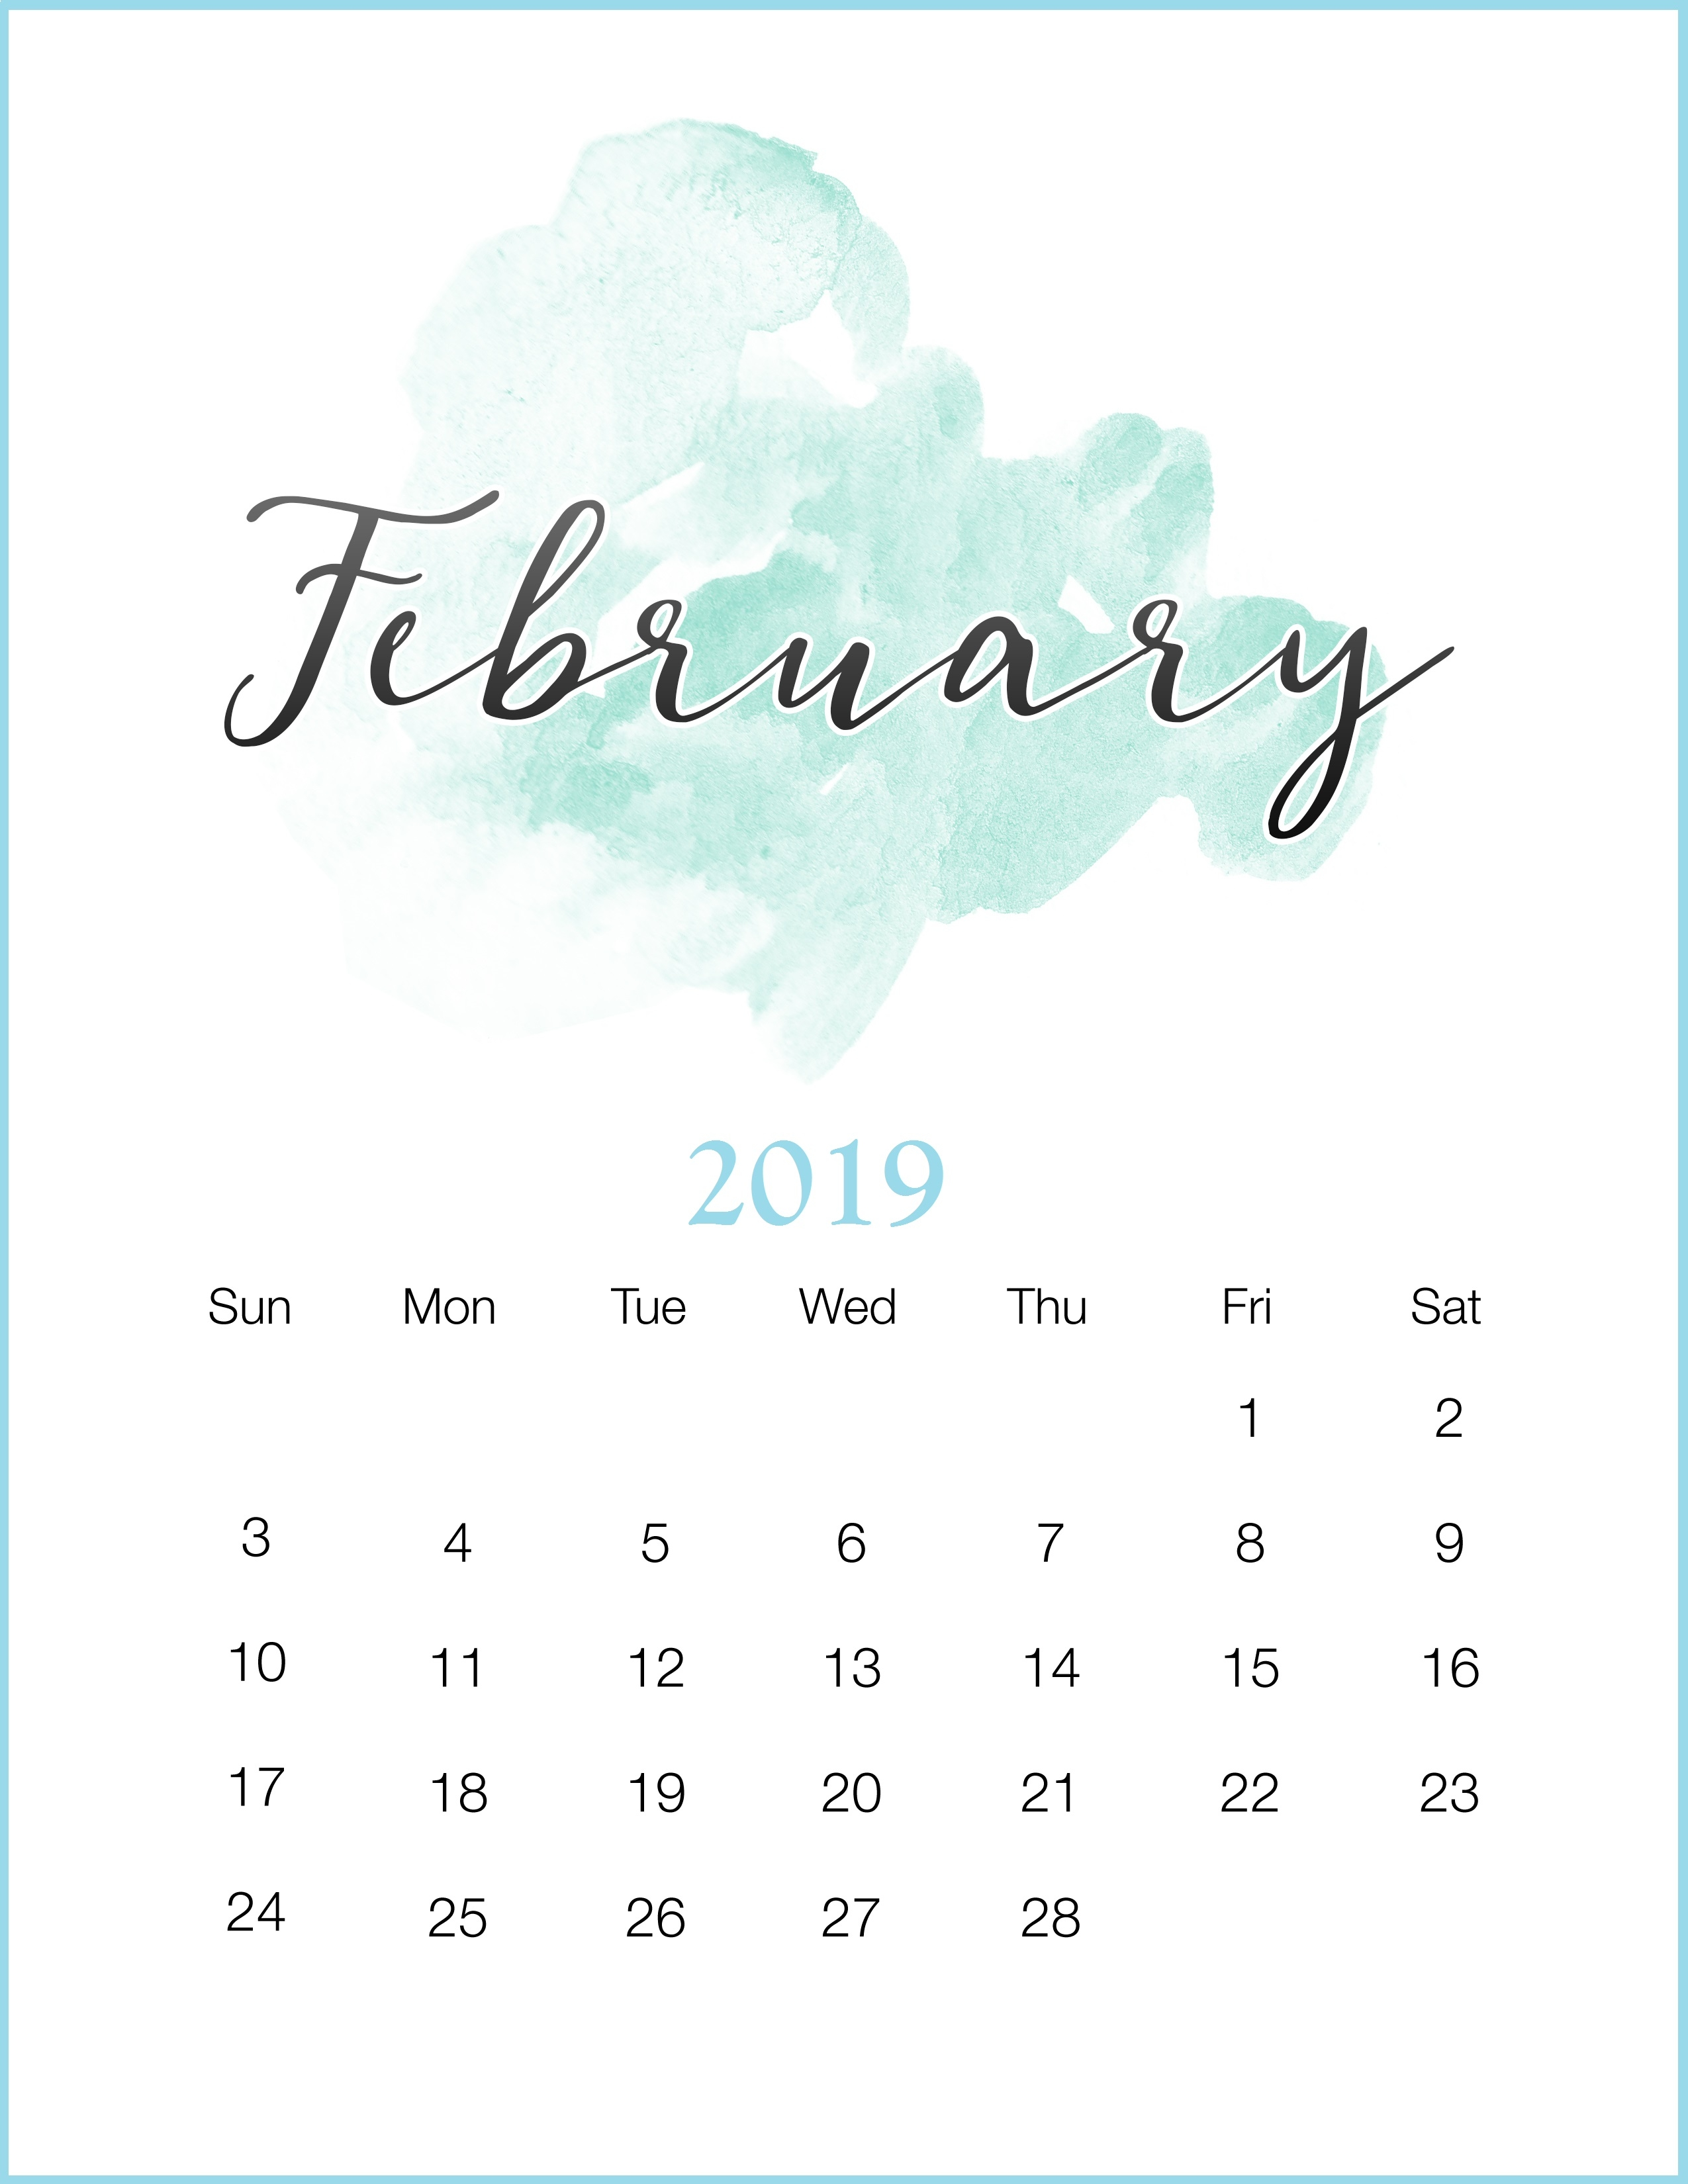 free template february 2019 editable calendar march 2019 calendar February 2019 Calendar erdferdf